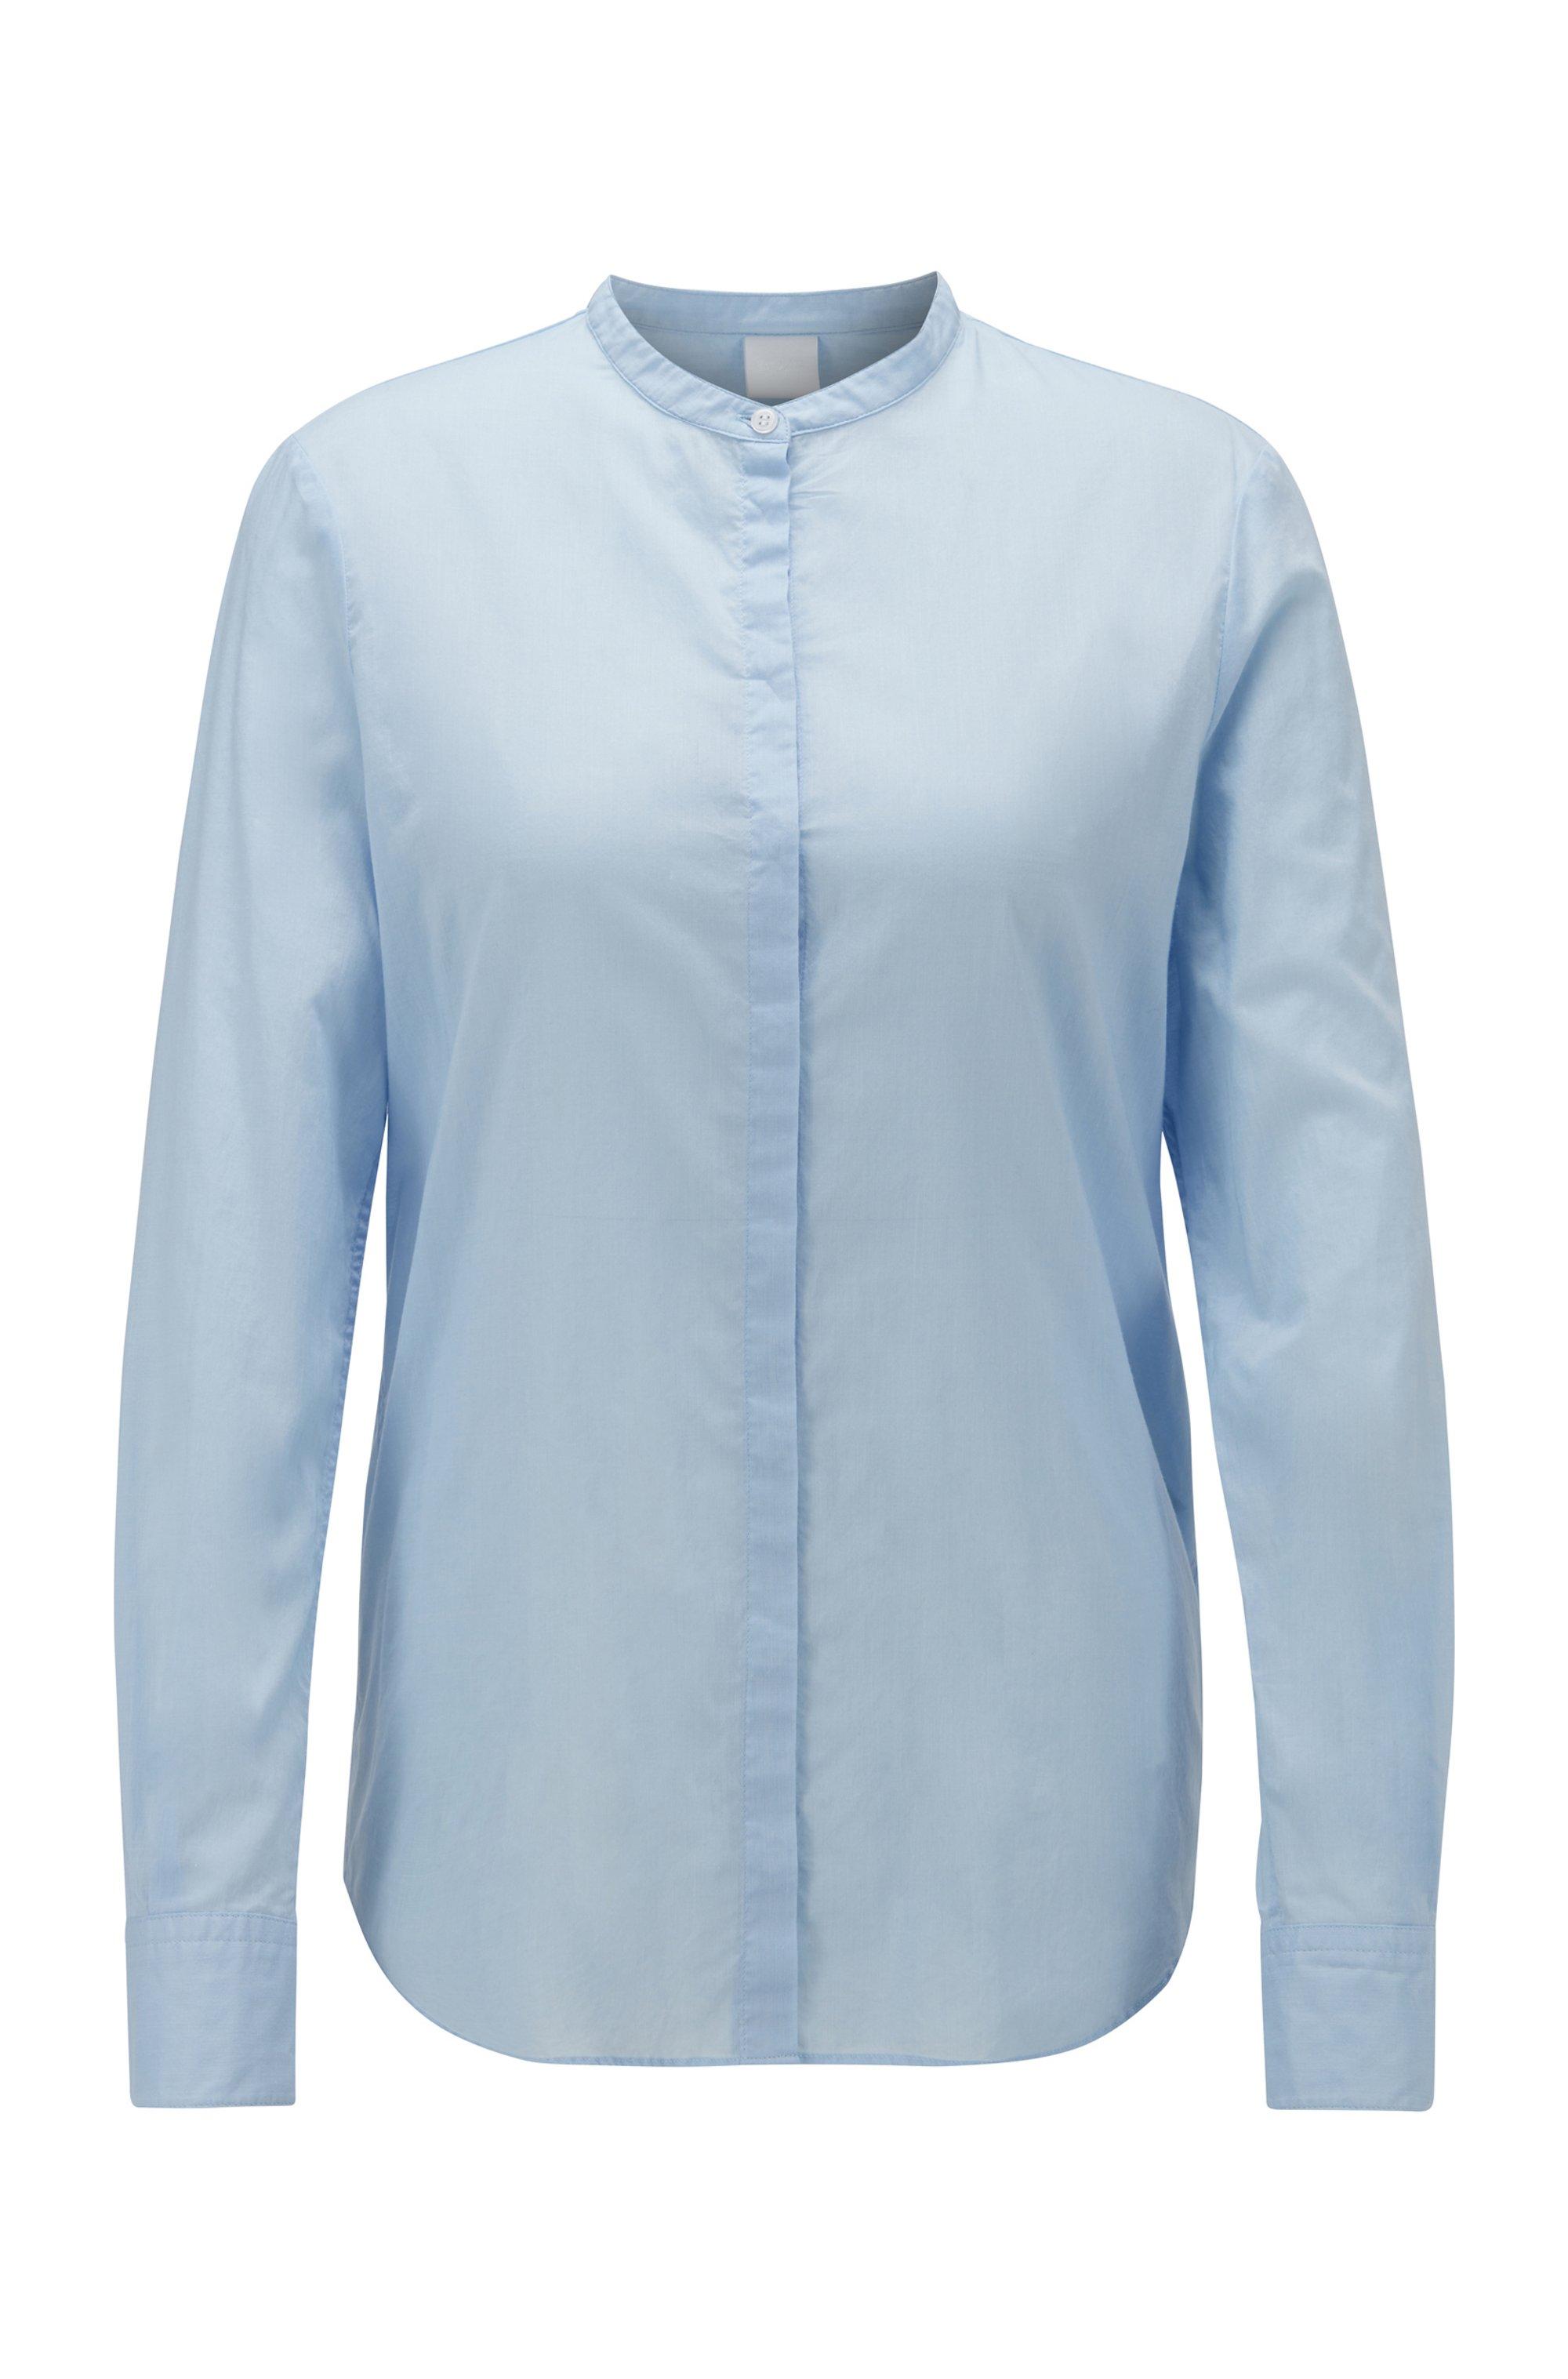 Relaxed-Fit Bluse aus Baumwoll-Mix, Hellblau